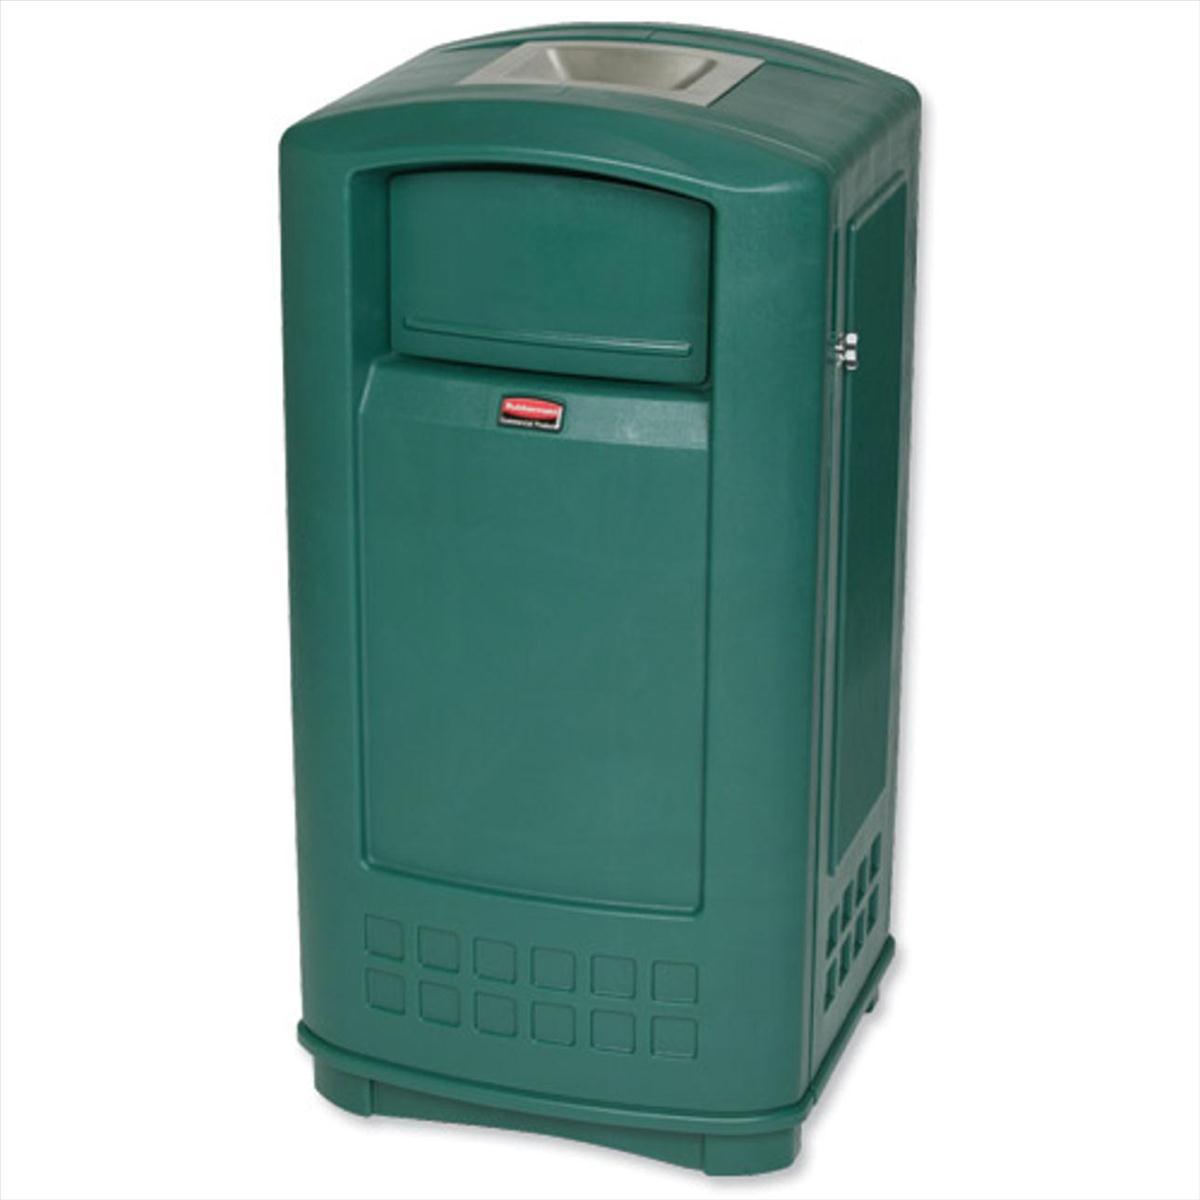 Rubbermaid Landmark Bin Durable Plastic With Ashtray Spring Loaded Doors 189 1 Litre Green Ref 3965 58